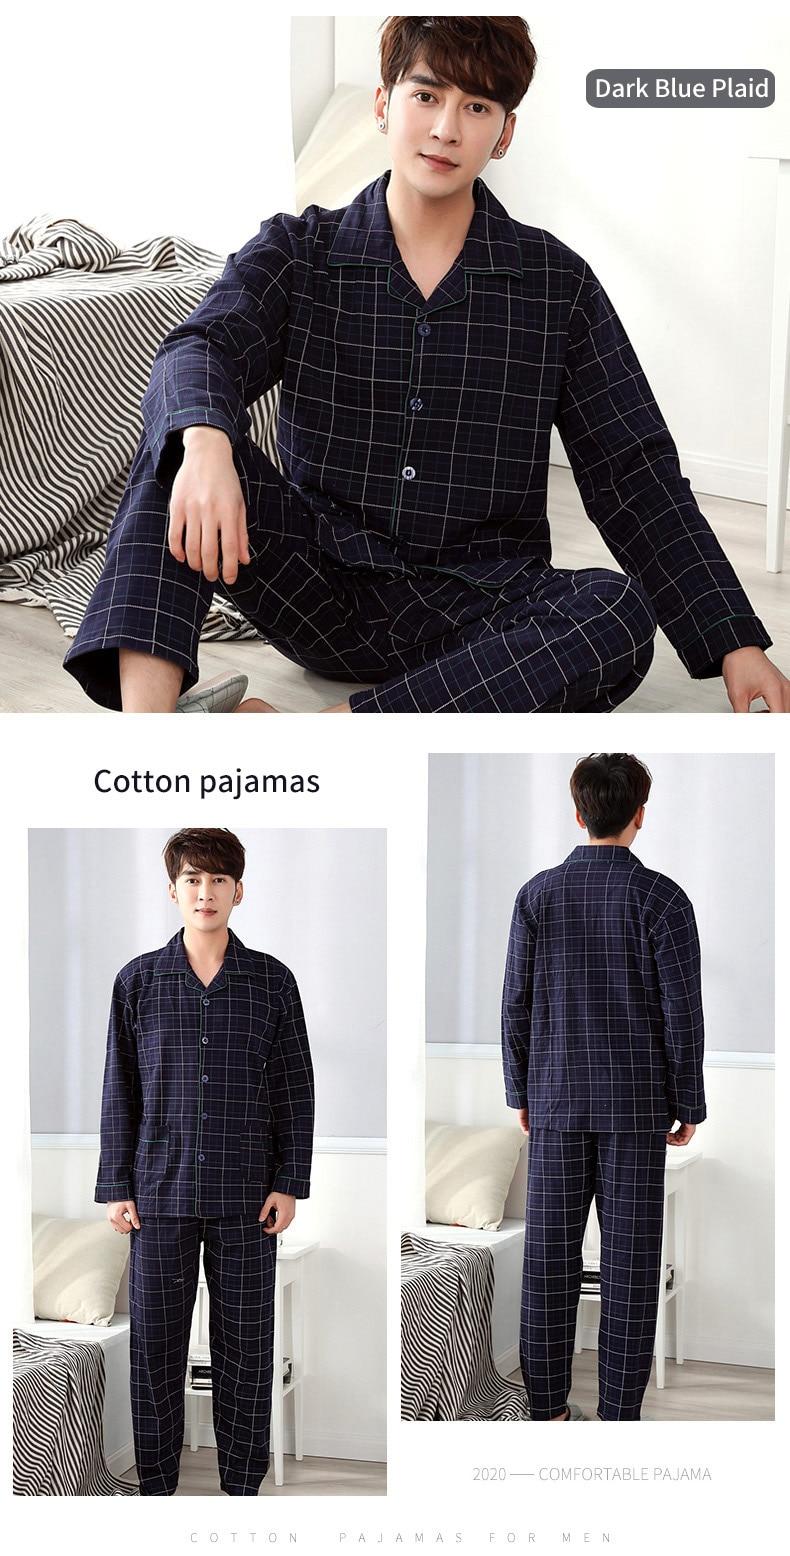 pijamas sólido xadrez pijamas do homem quente